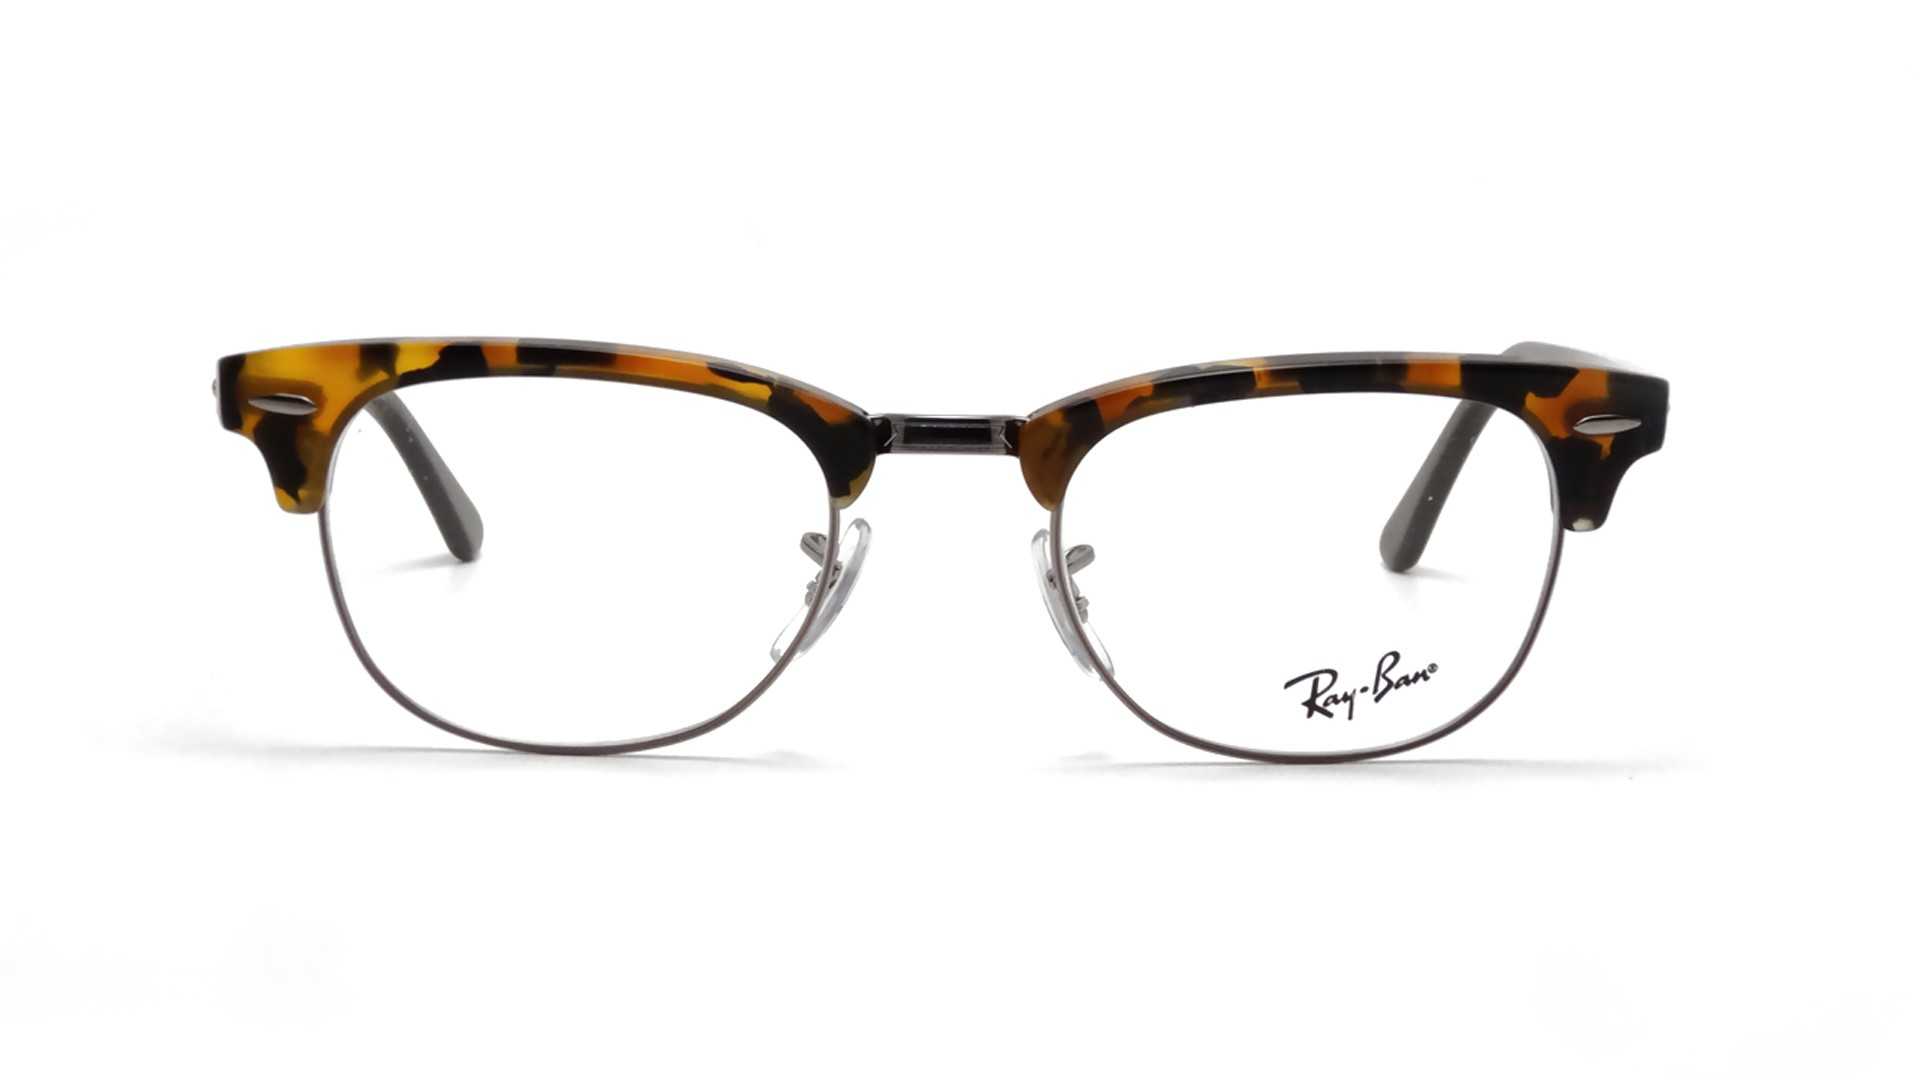 Ray Ban Clubmaster Tortoise Eyeglasses